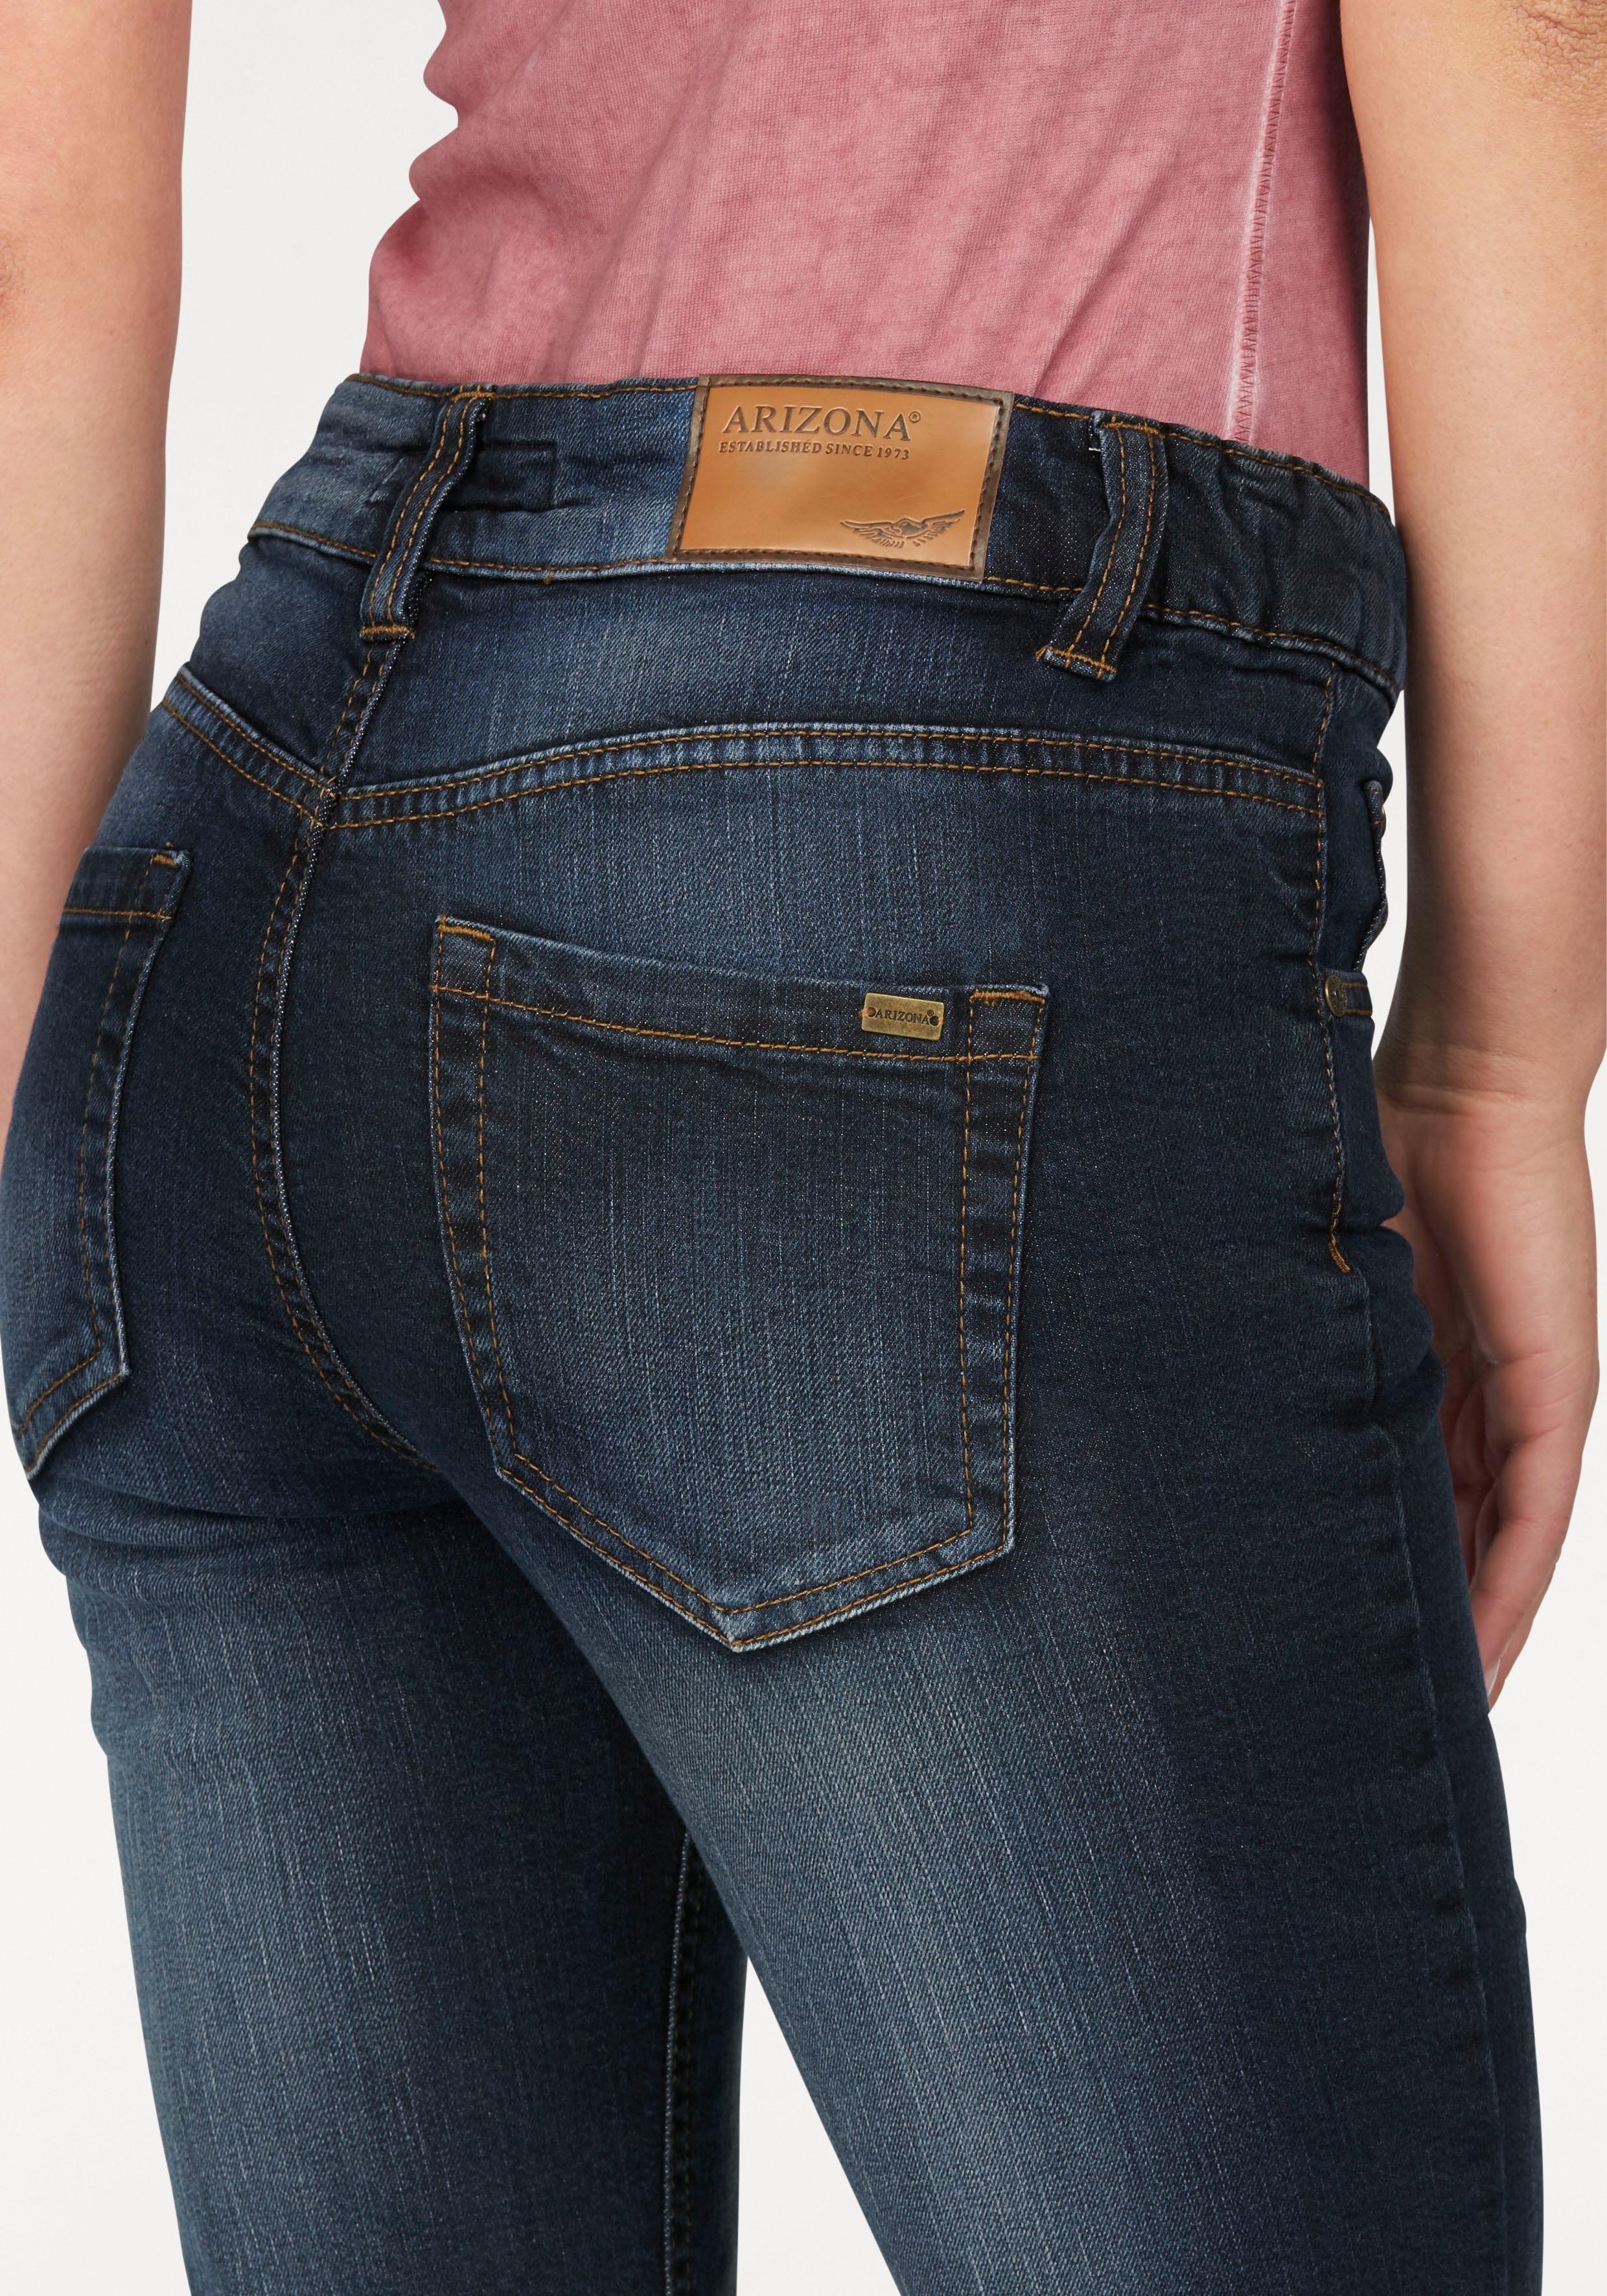 jeans Online Verkrijgbaar 'svenja Bootcut Arizona Bootcut' bfg67Yy